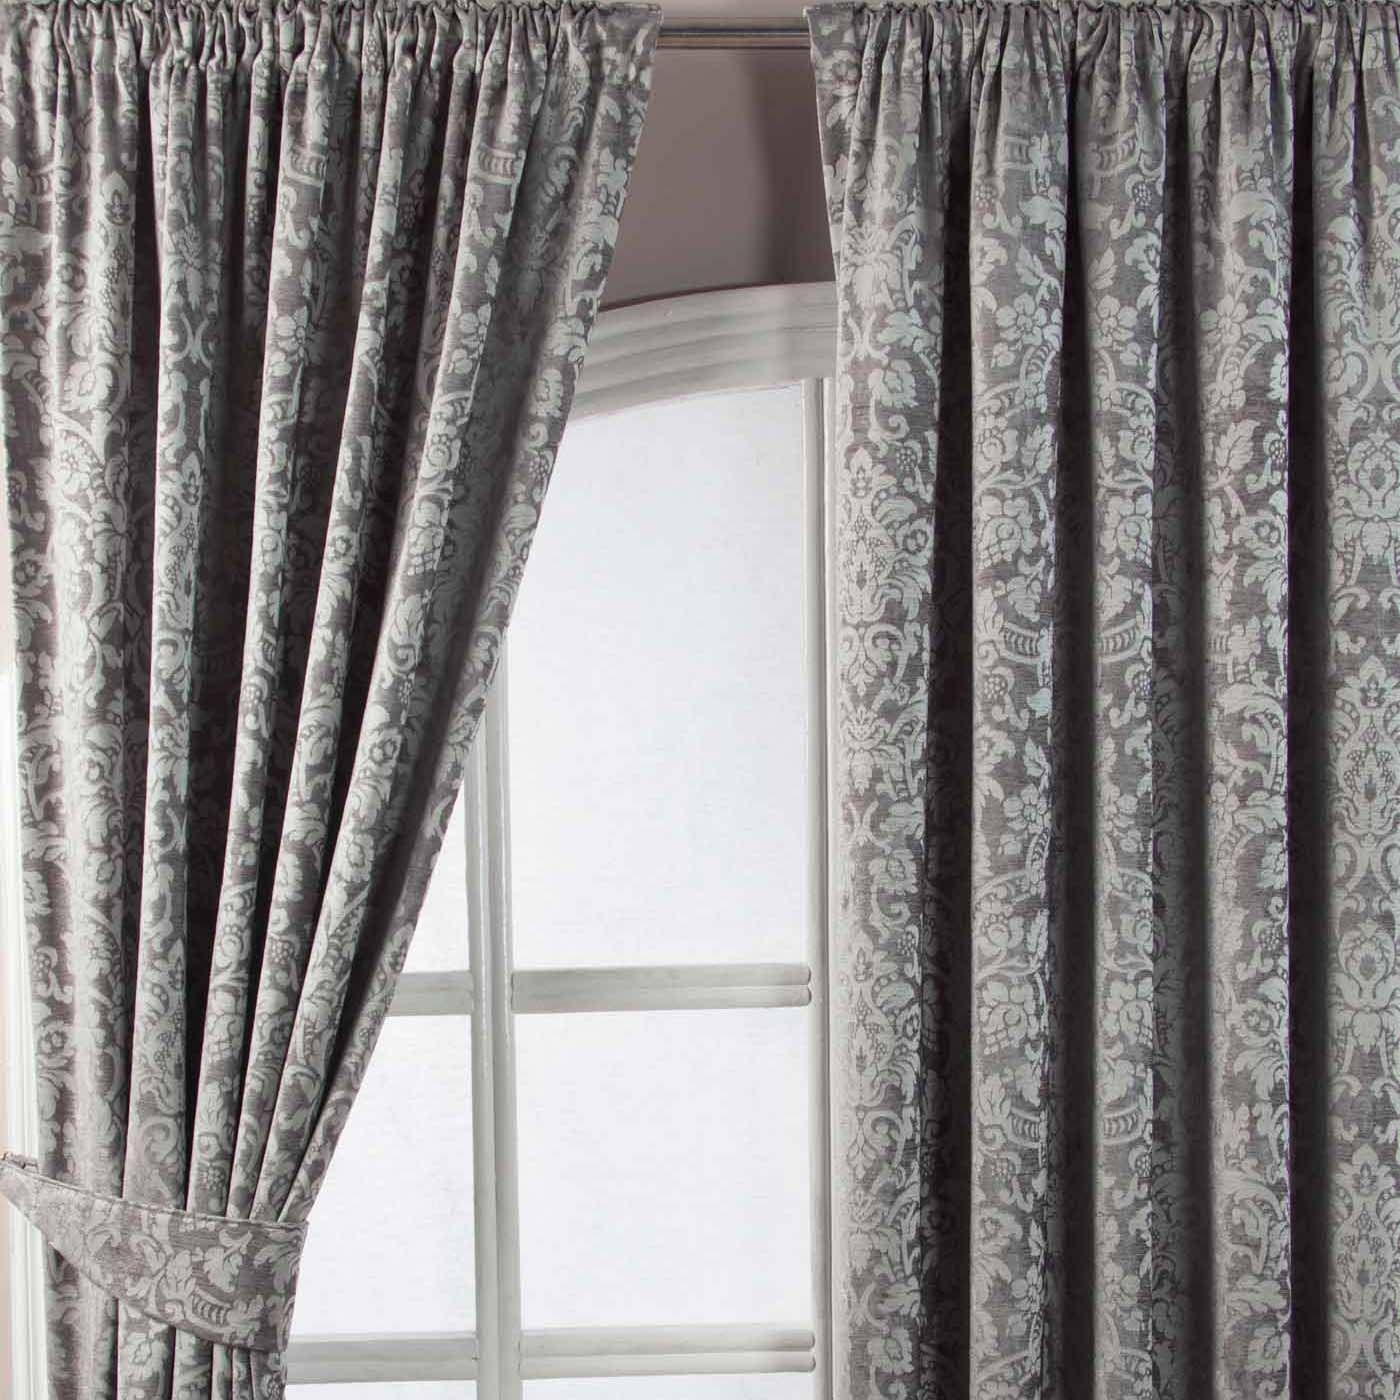 Grey Velvet Jacquard Pencil Pleat Lined Curtain Pair 46 X 54 In 2020 Lined Curtains Curtains Pair Grey Curtains Bedroom